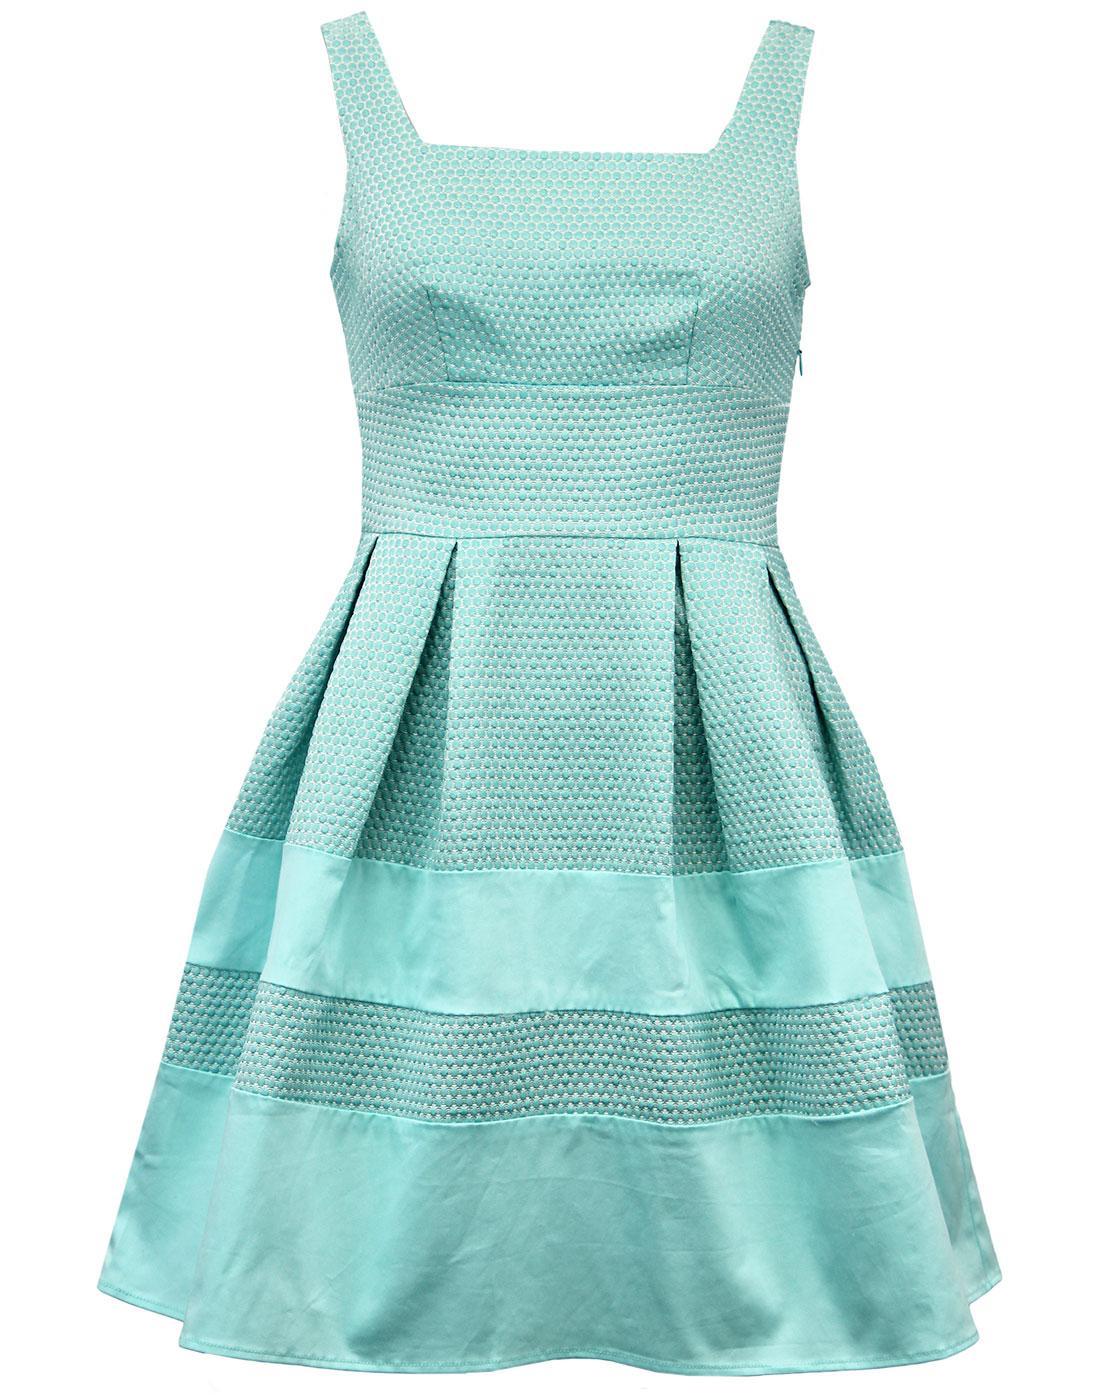 DARLING Nancey Retro 60s Textured Vintage Polka Dot Prom Dress